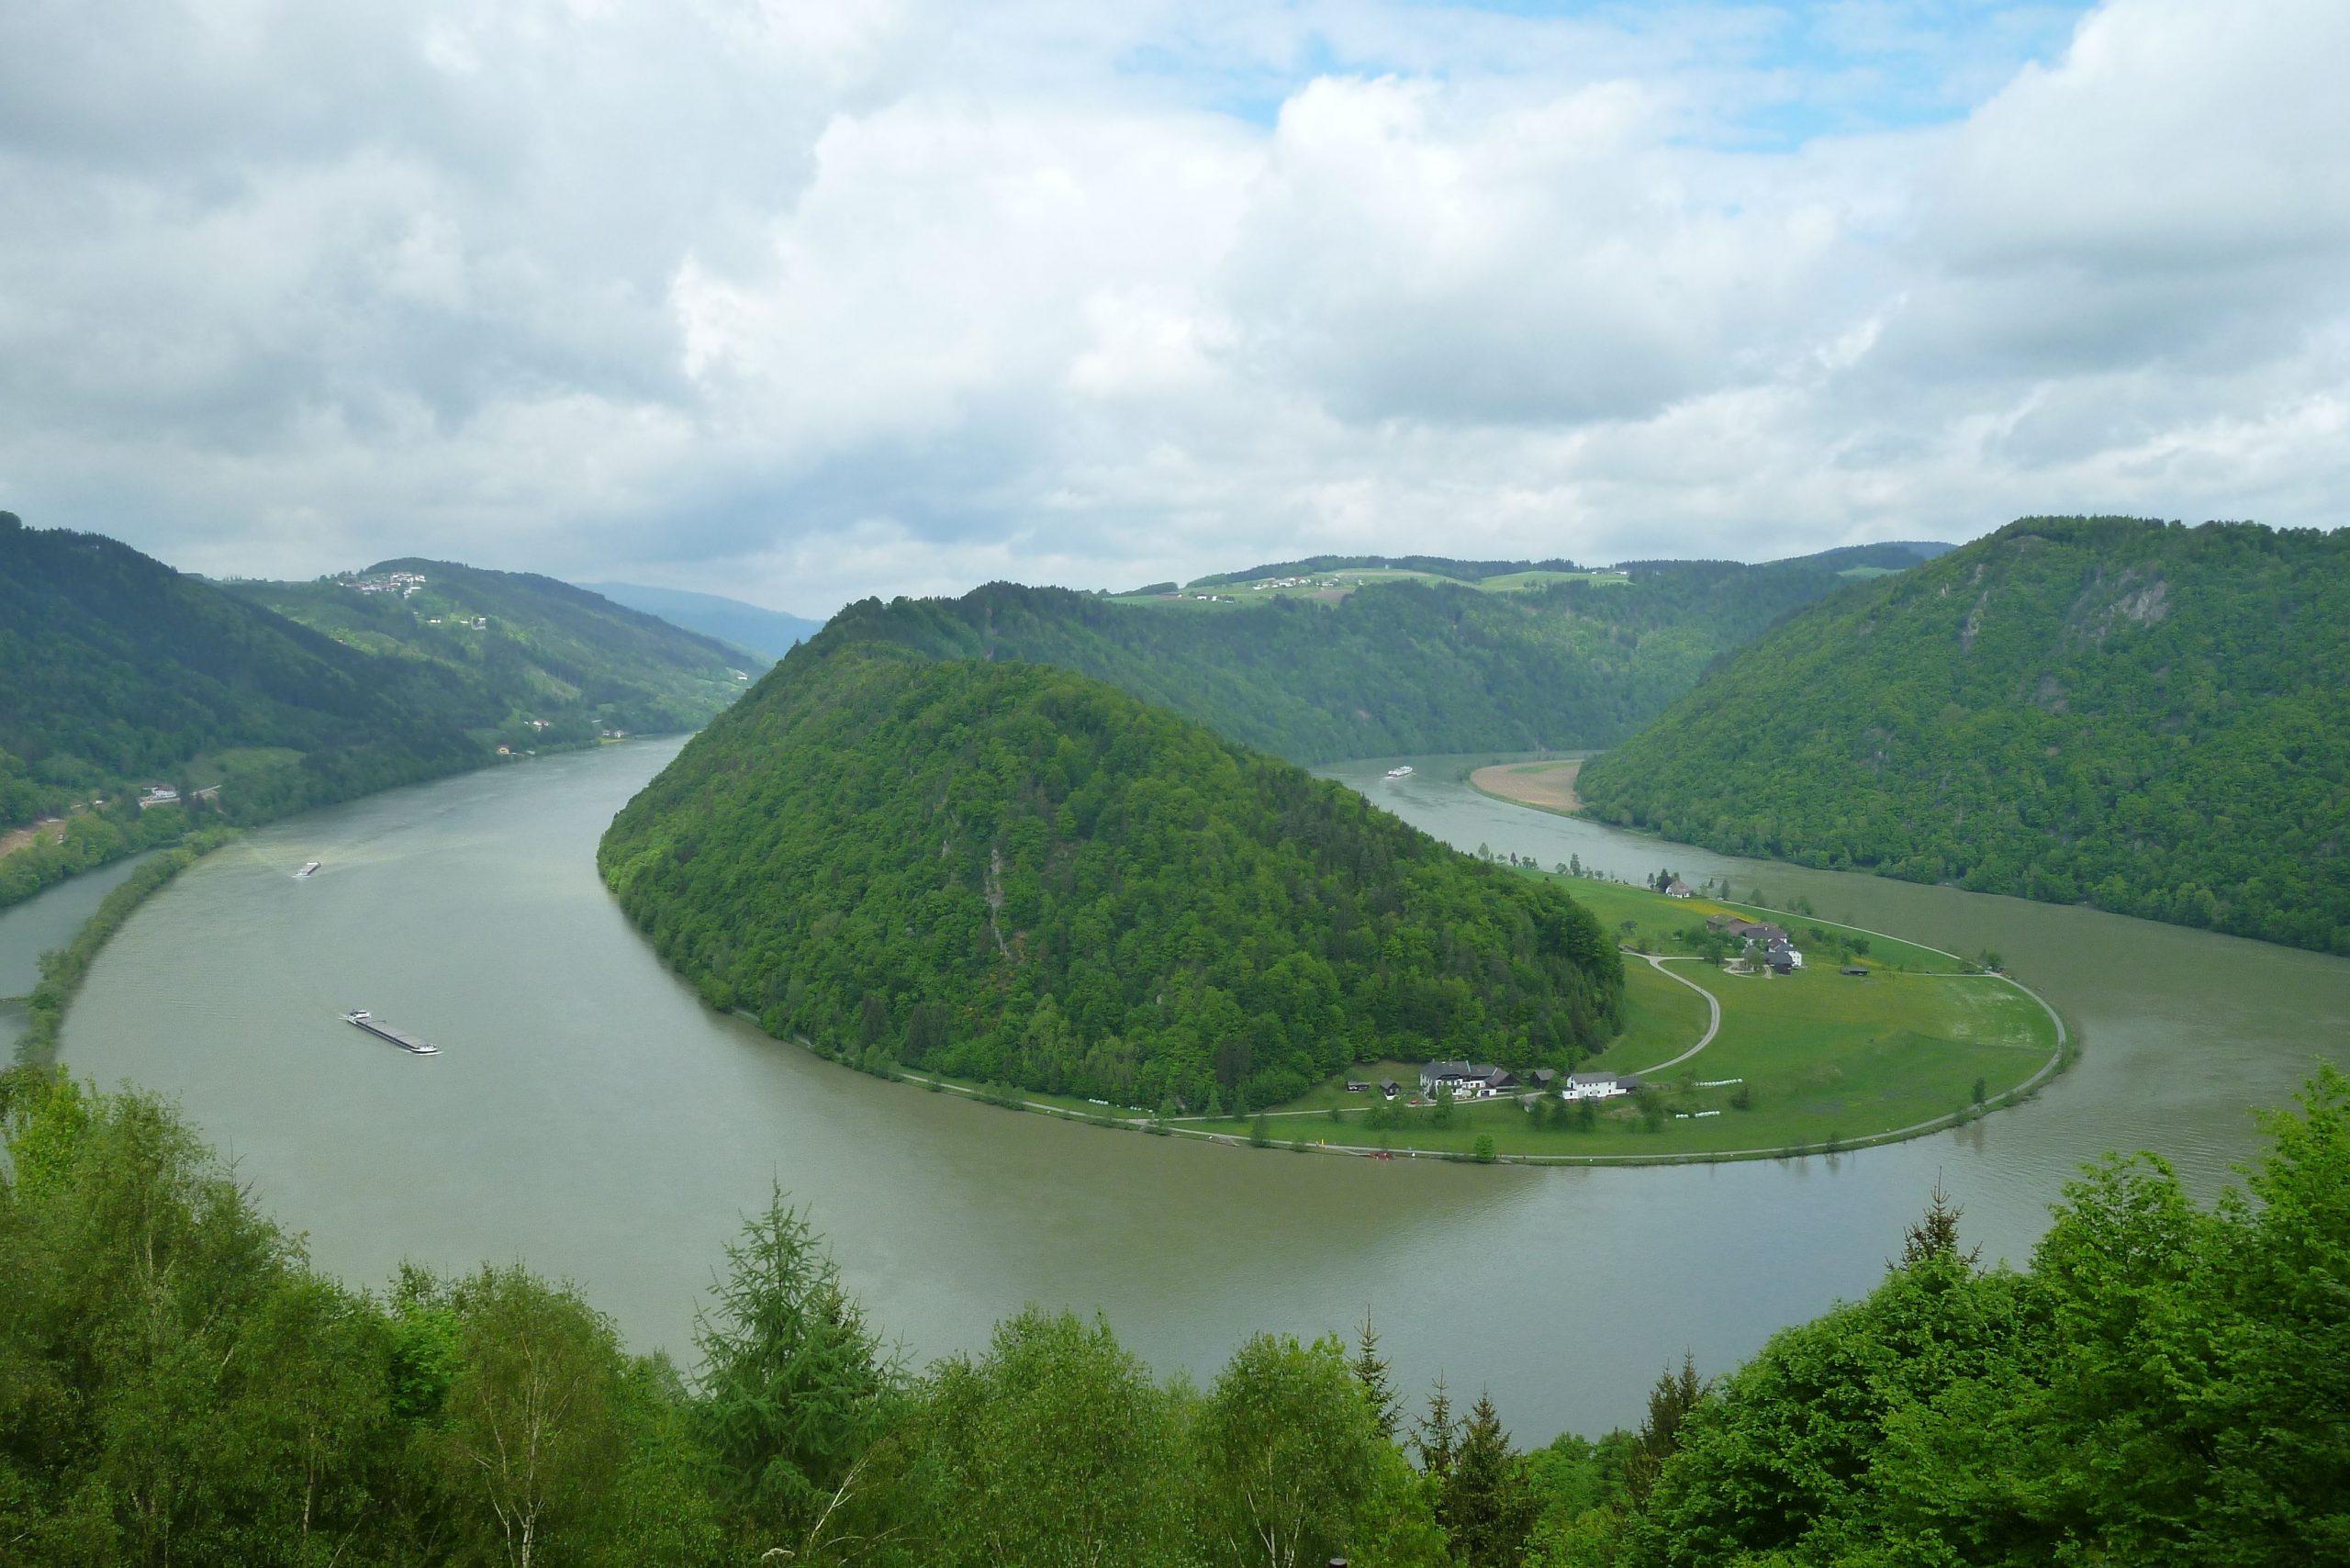 Donau - Schlögener Schlinge